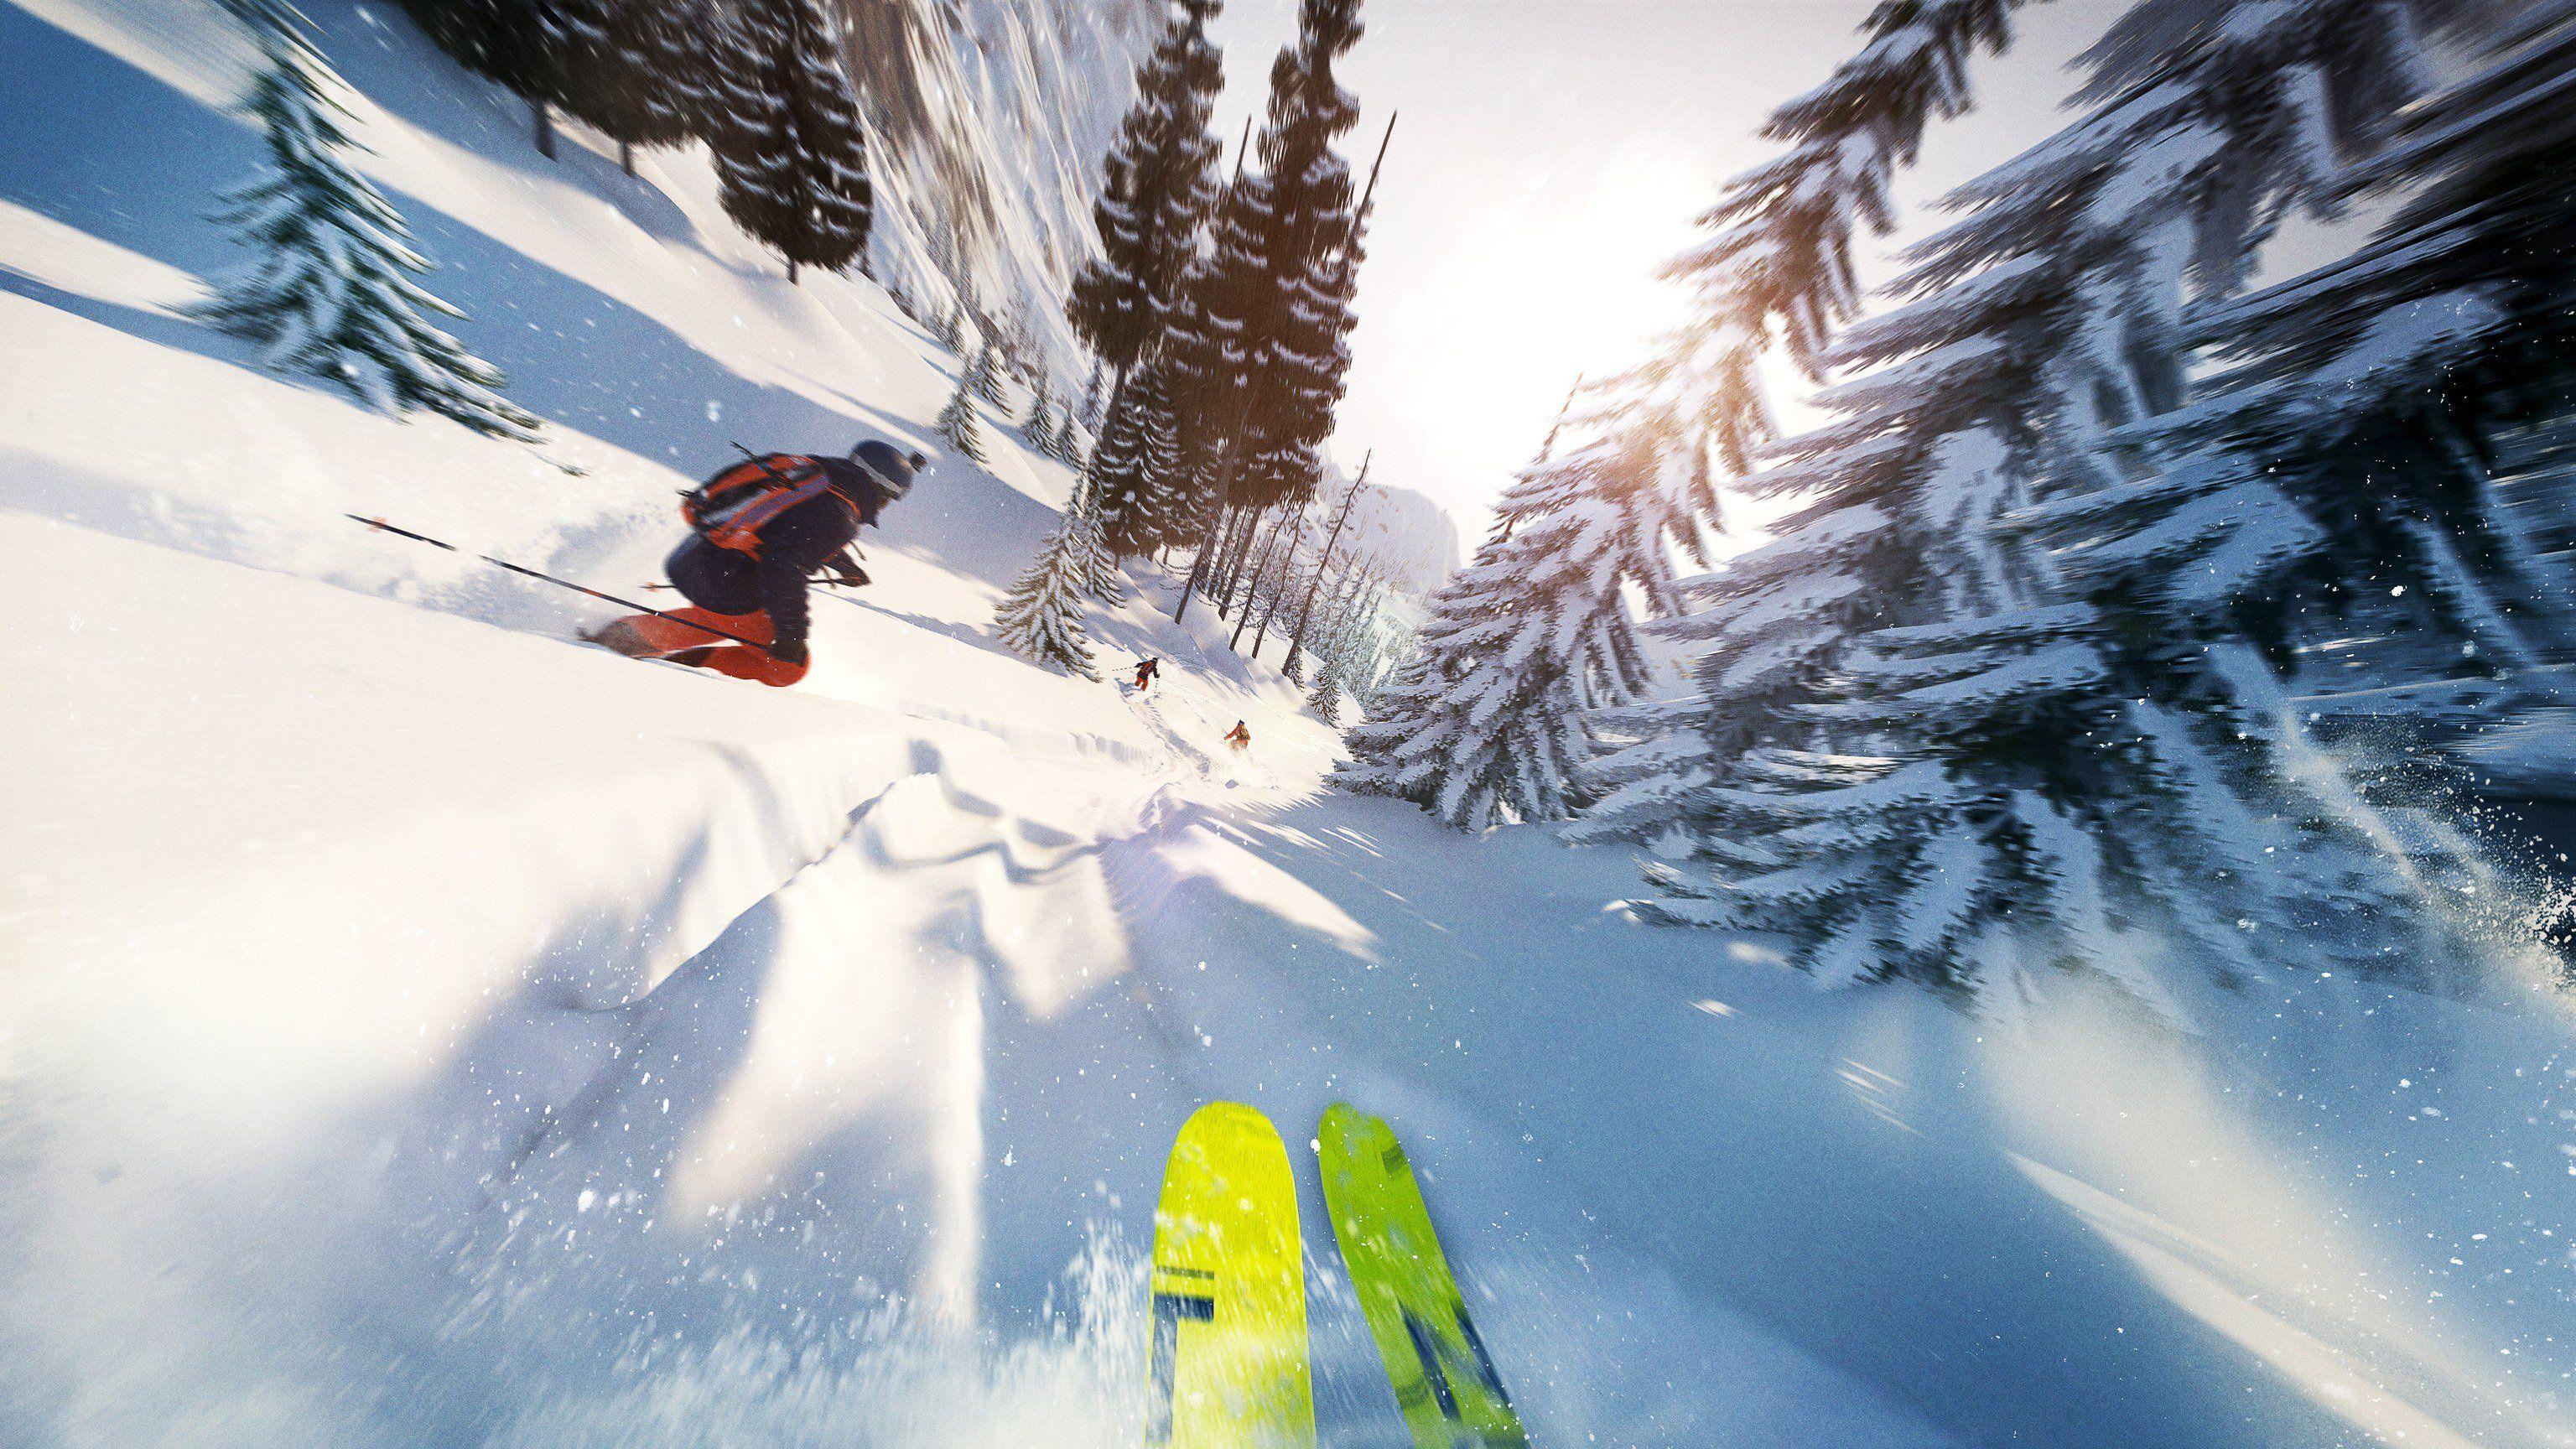 STEEP (PC, PS4, Xbox One) - Esquí, Snowboard #Steep #Esqui #SteepGame #Snowboard #Sports #SportsGame #Ubisoft #Deportes